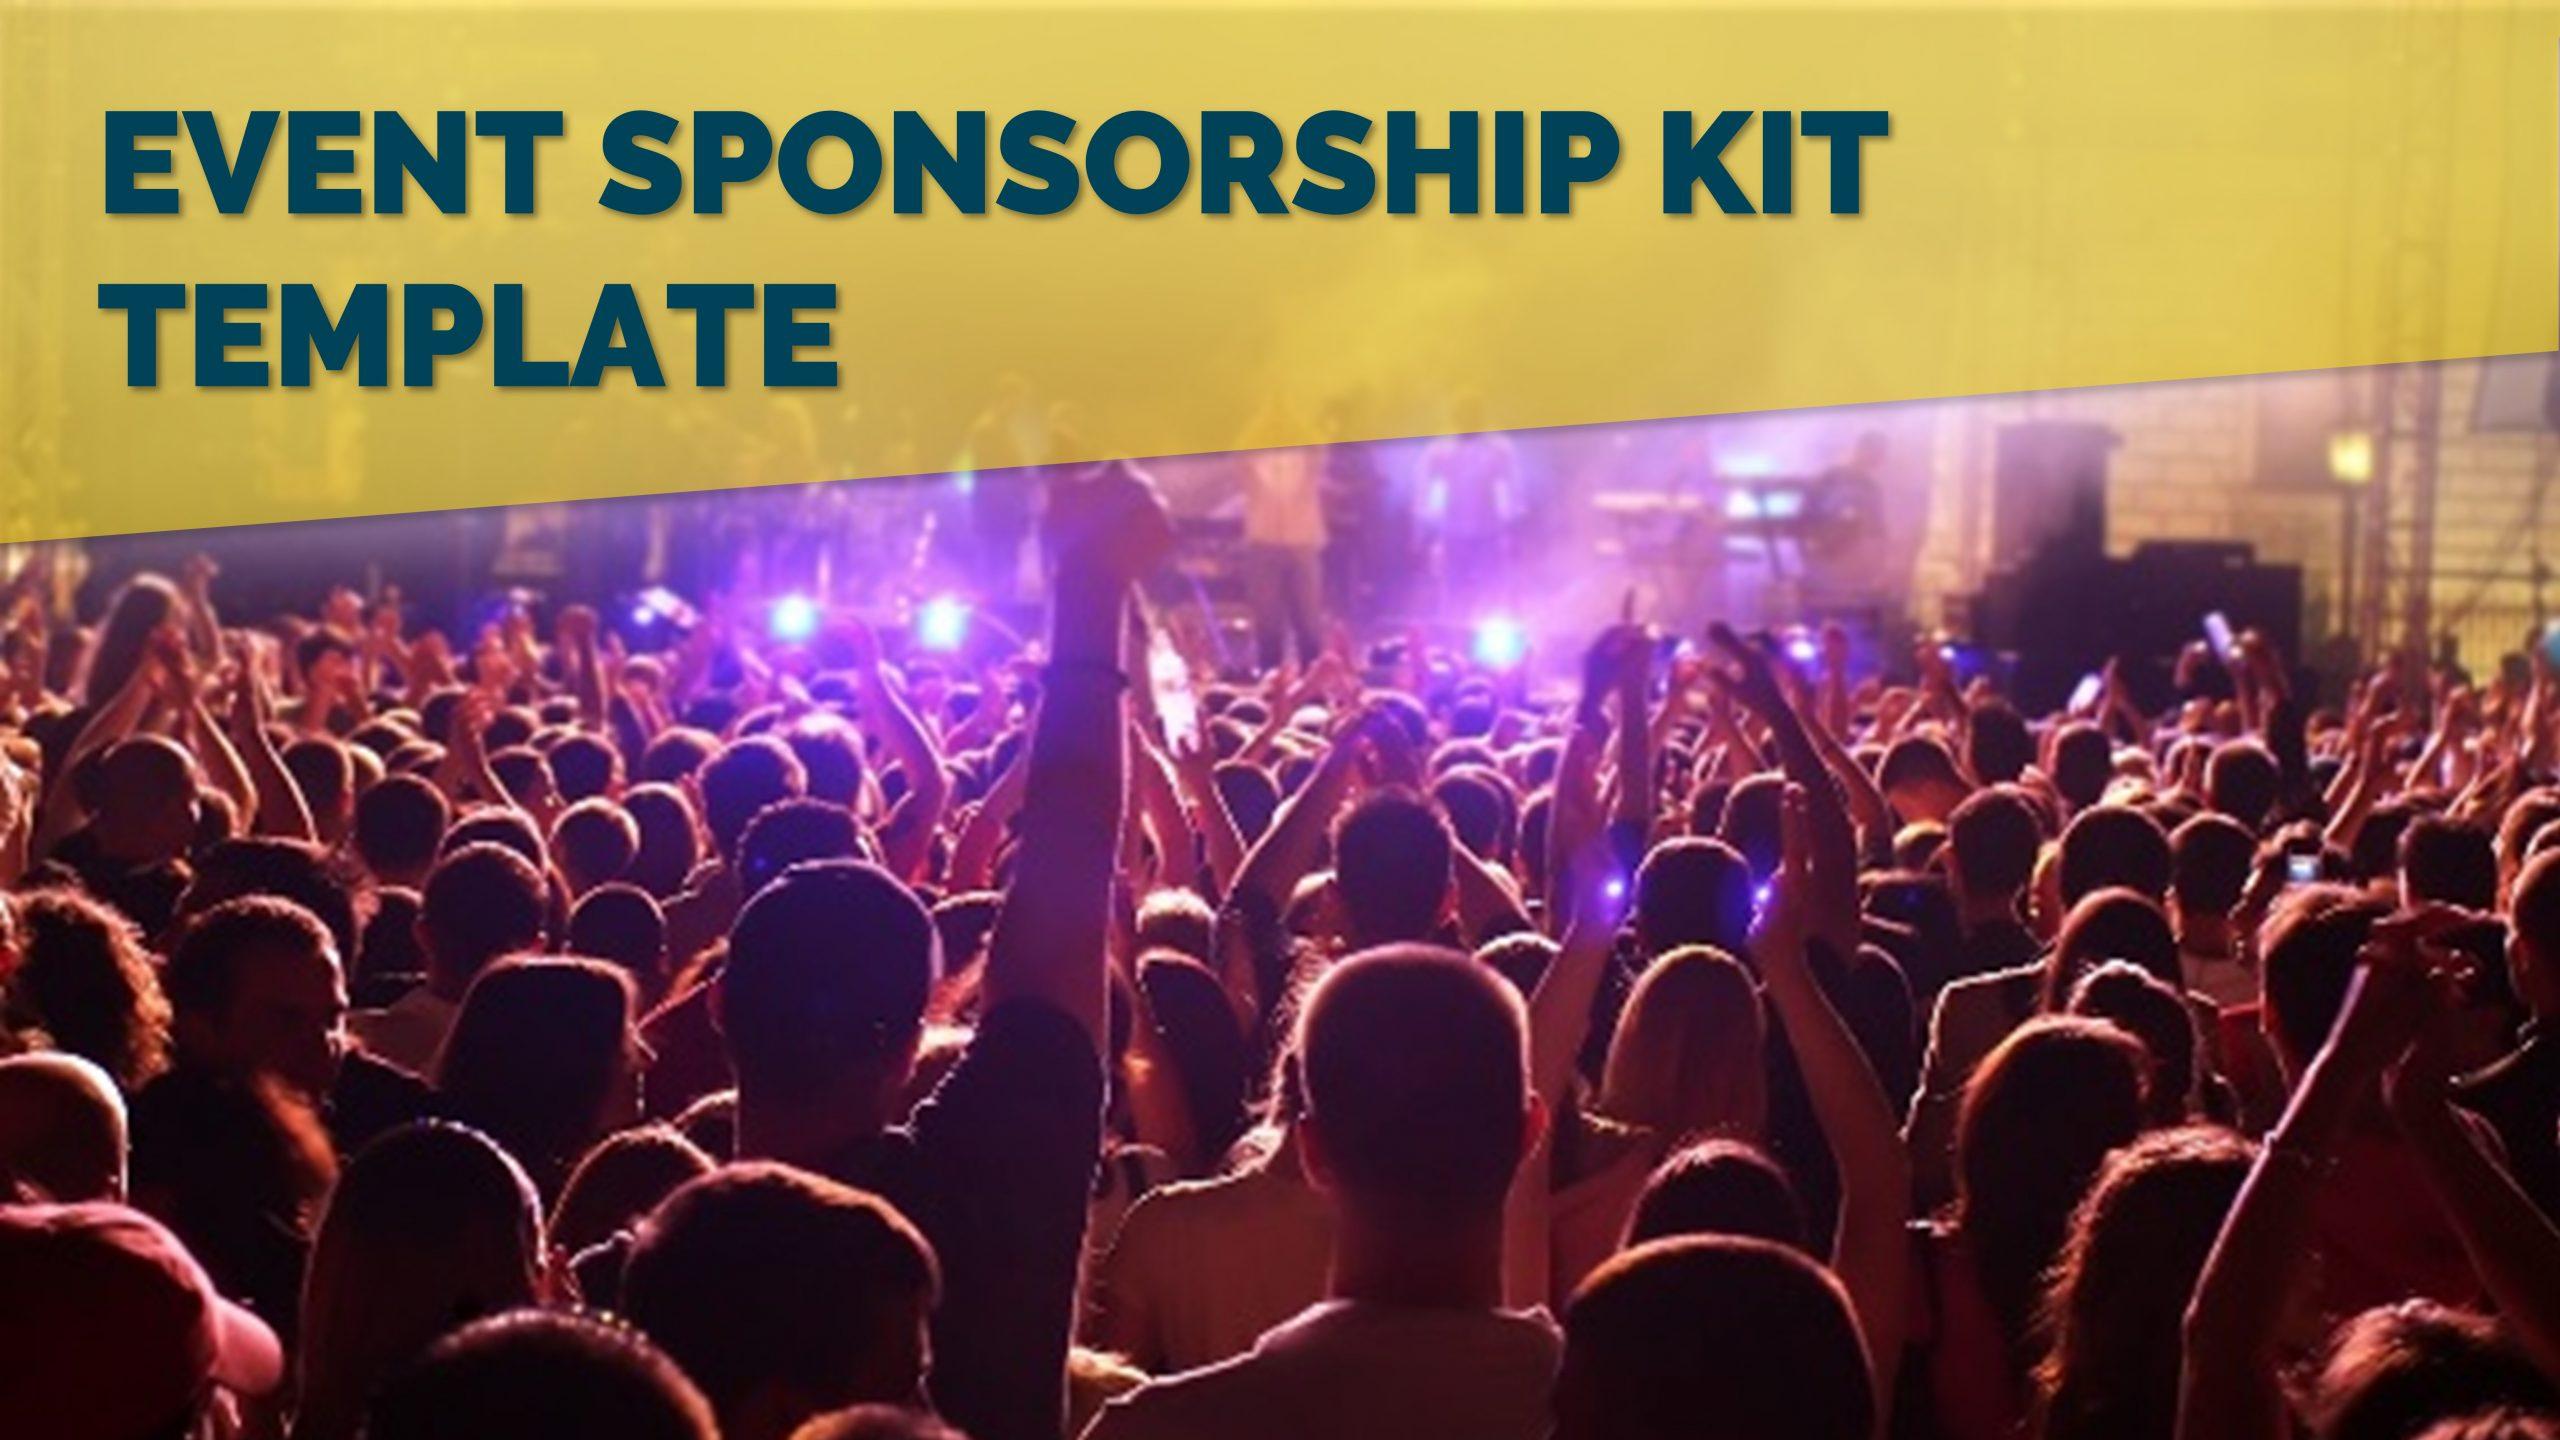 Free presentation template of Event Sponsorship Kit